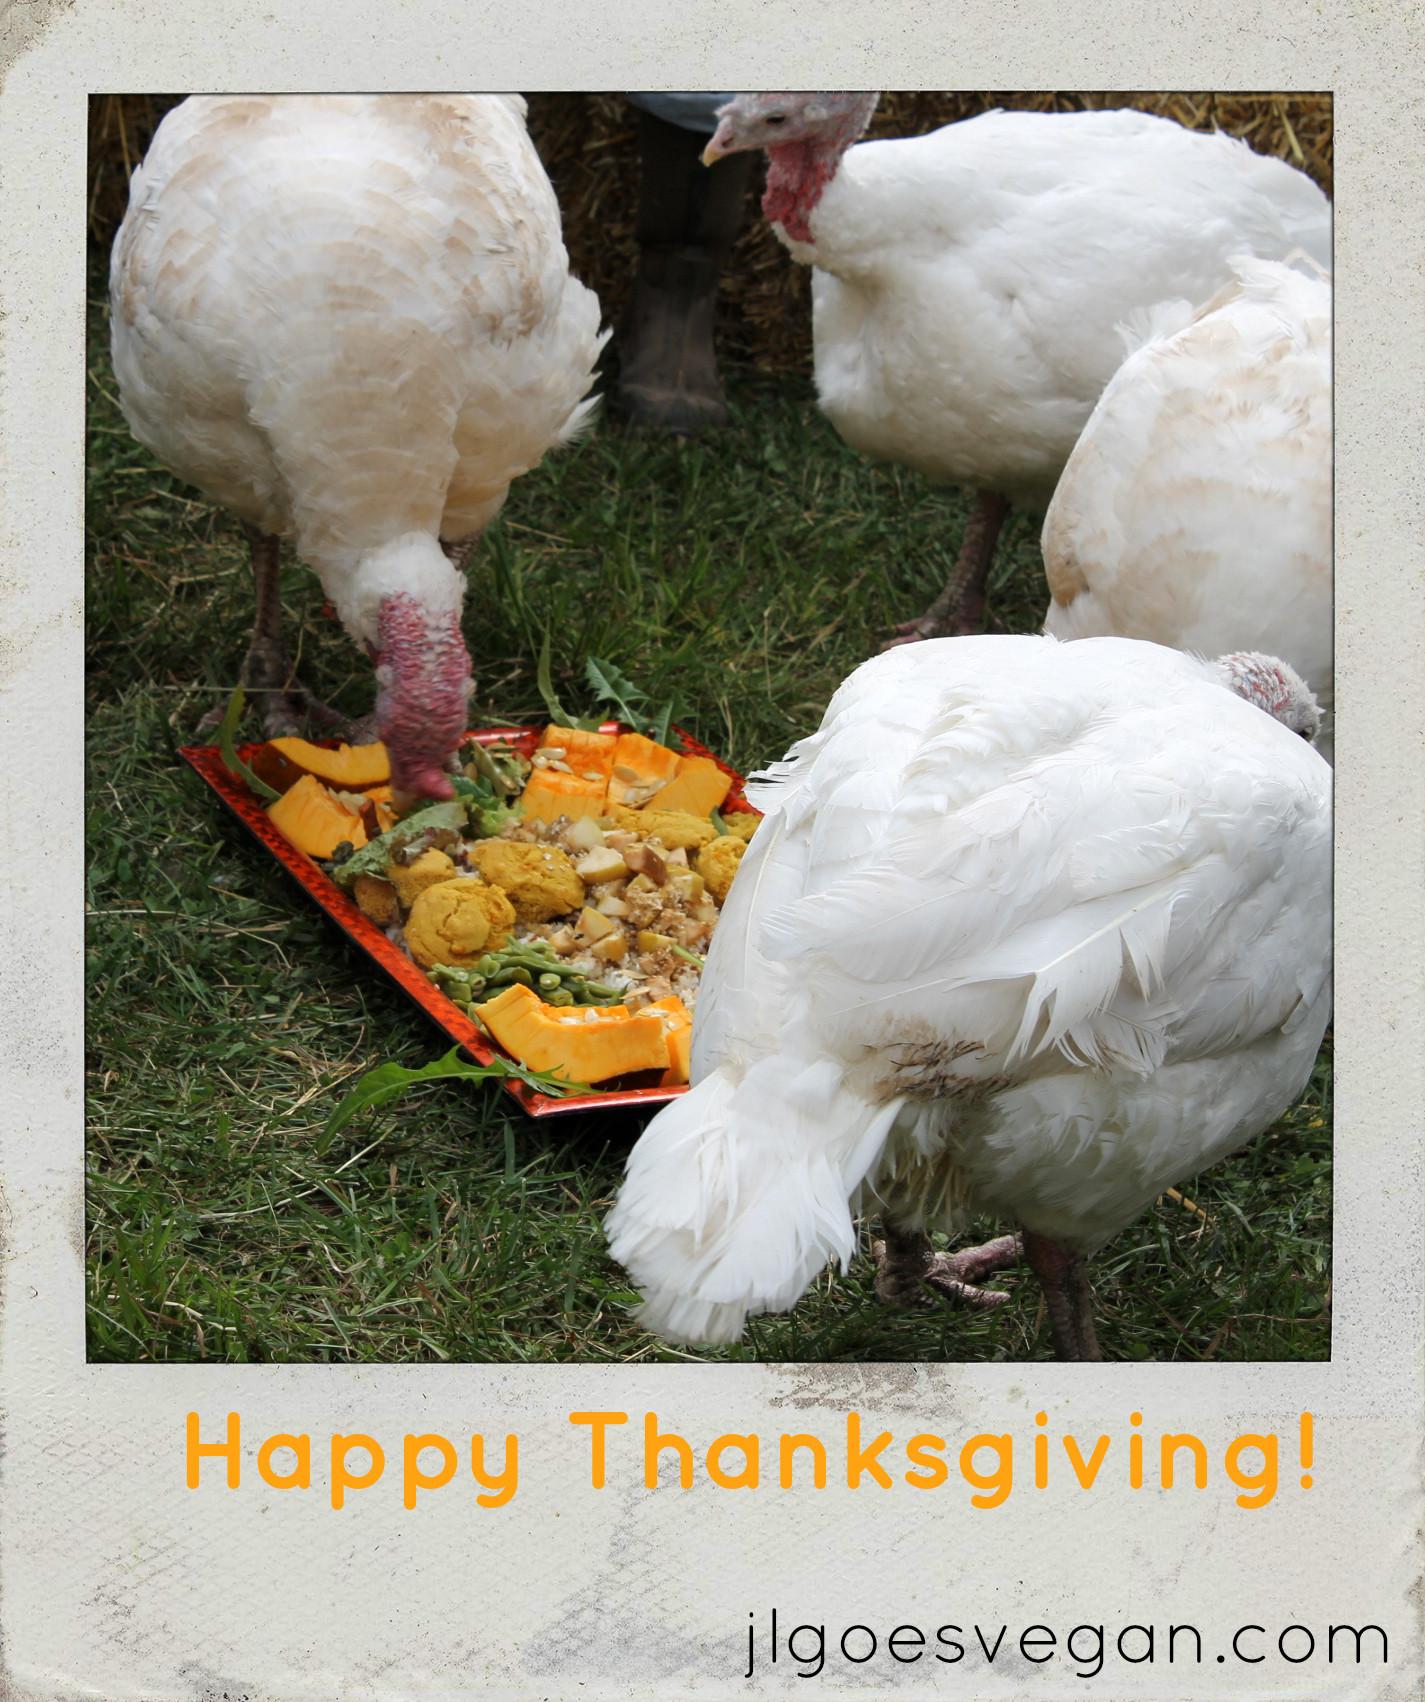 Happy Thanksgiving Vegetarian  Happy Vegan Thanksgiving JL Fields